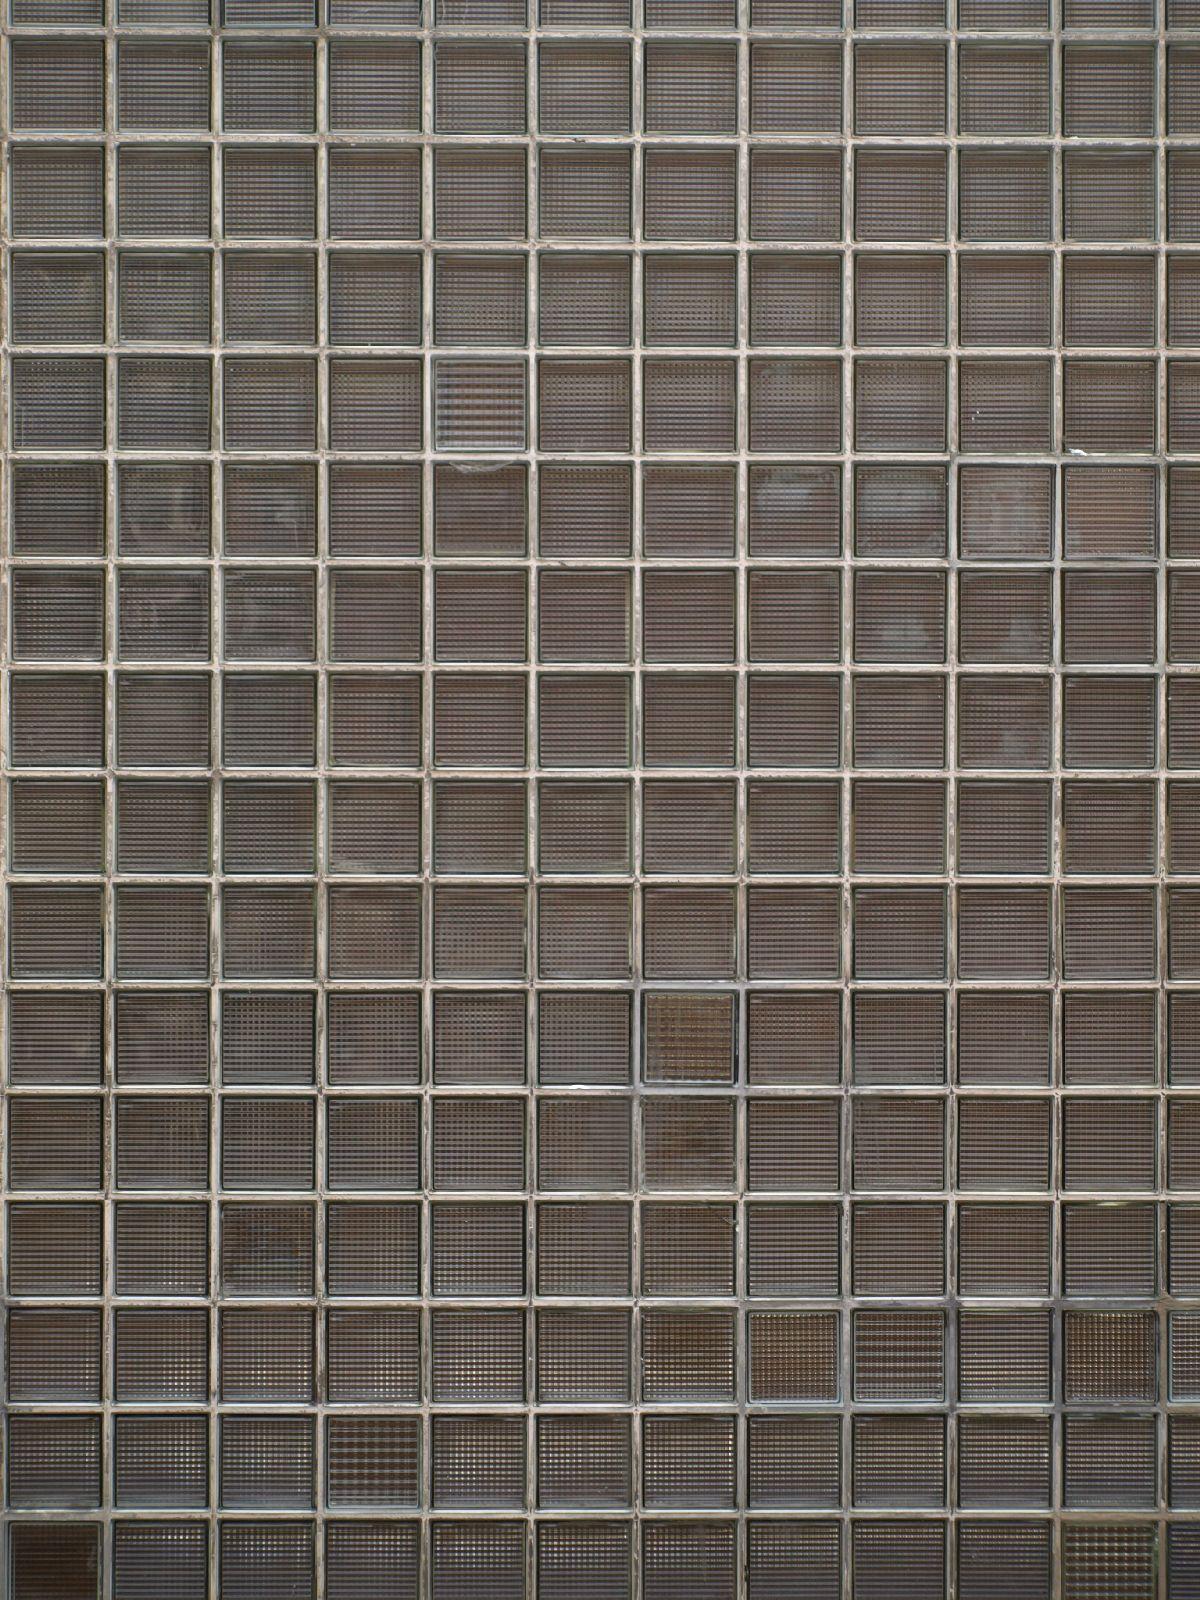 Brick_Texture_A_PA039912